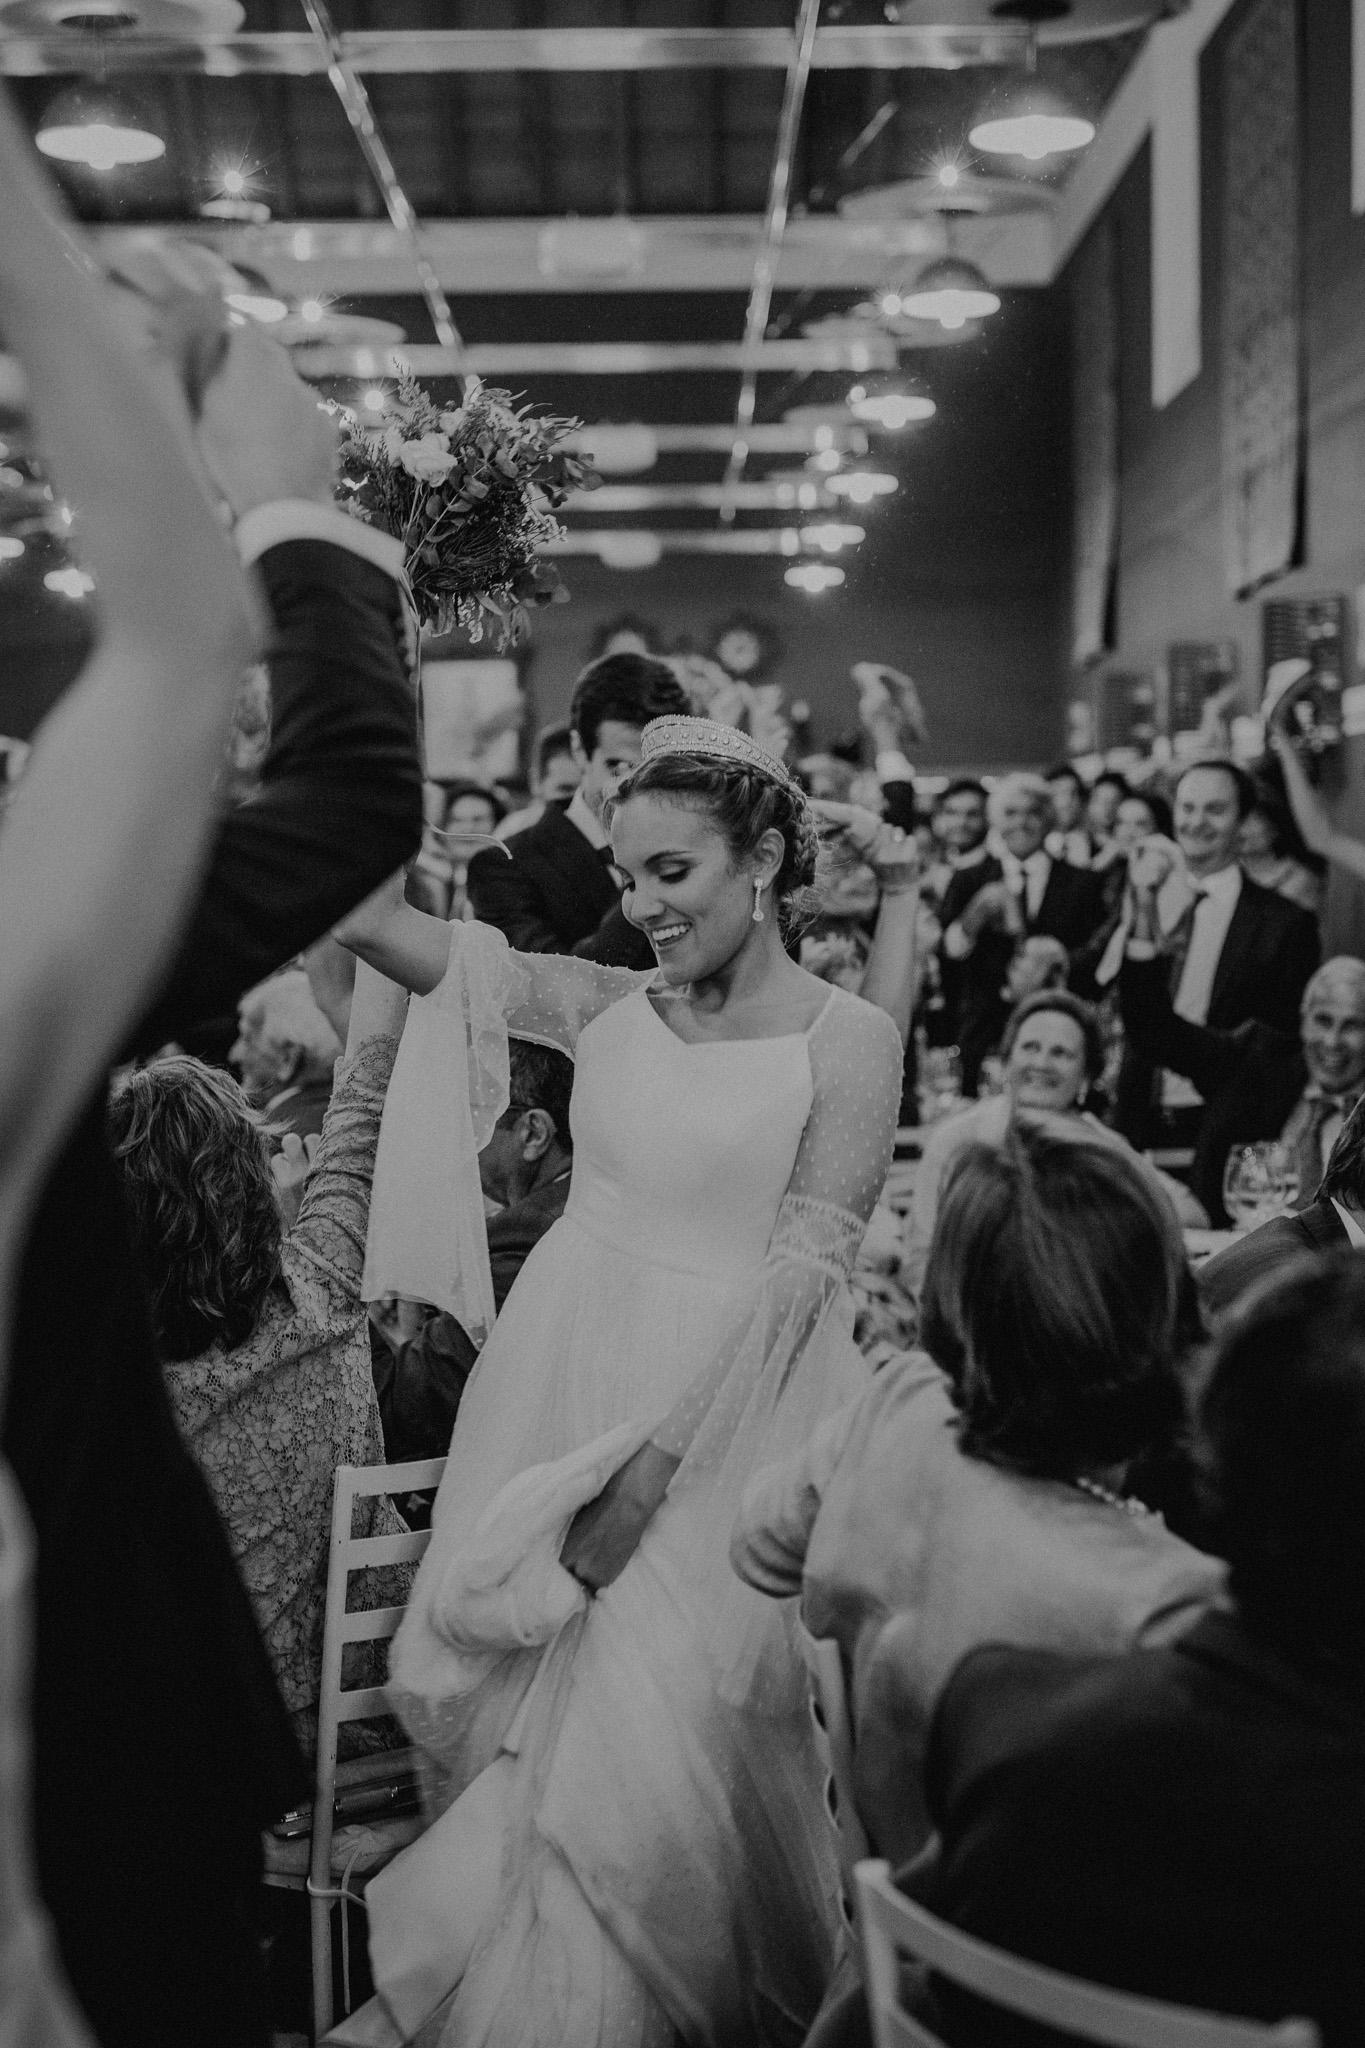 fotografia-boda-wedding-photographer-spain-concorazon-198b